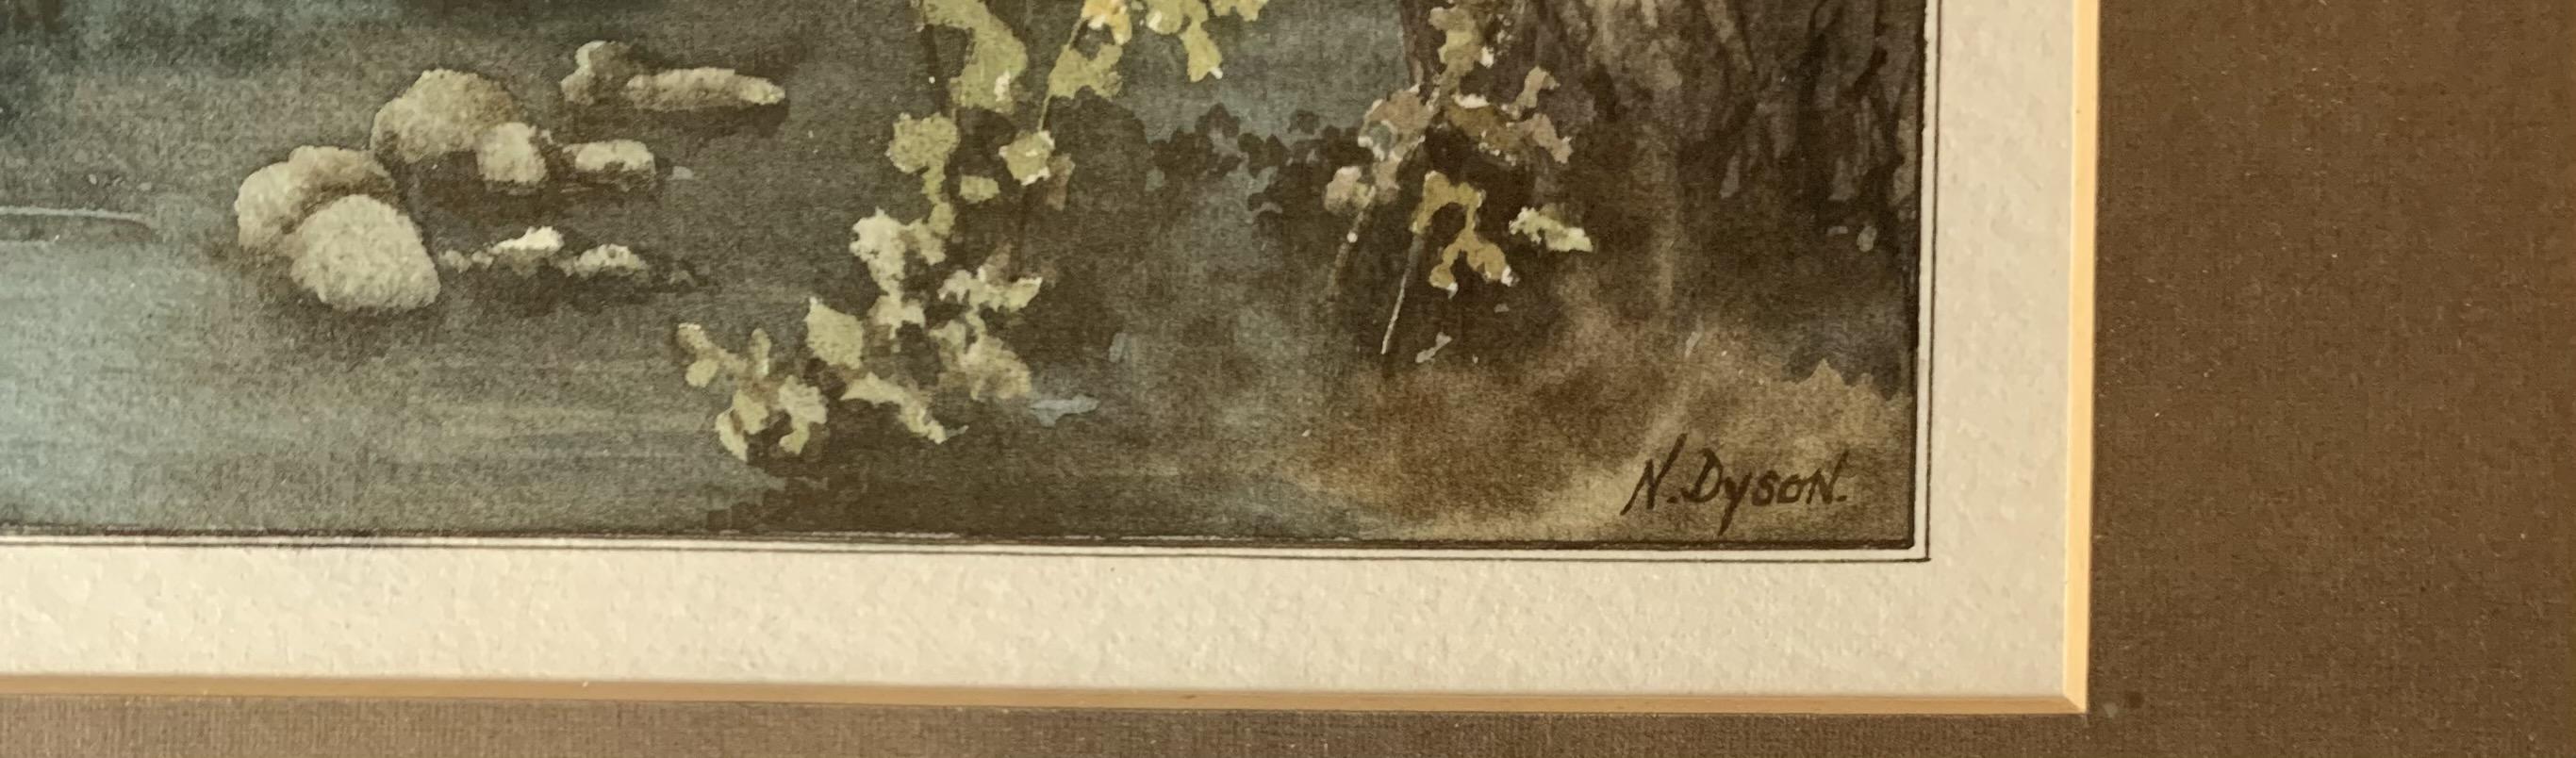 "2 Watercolours - landscape by Ebenezer John Woods Prior. Image 10.5"" x 8"", frame 17"" x 14"". - Image 3 of 7"